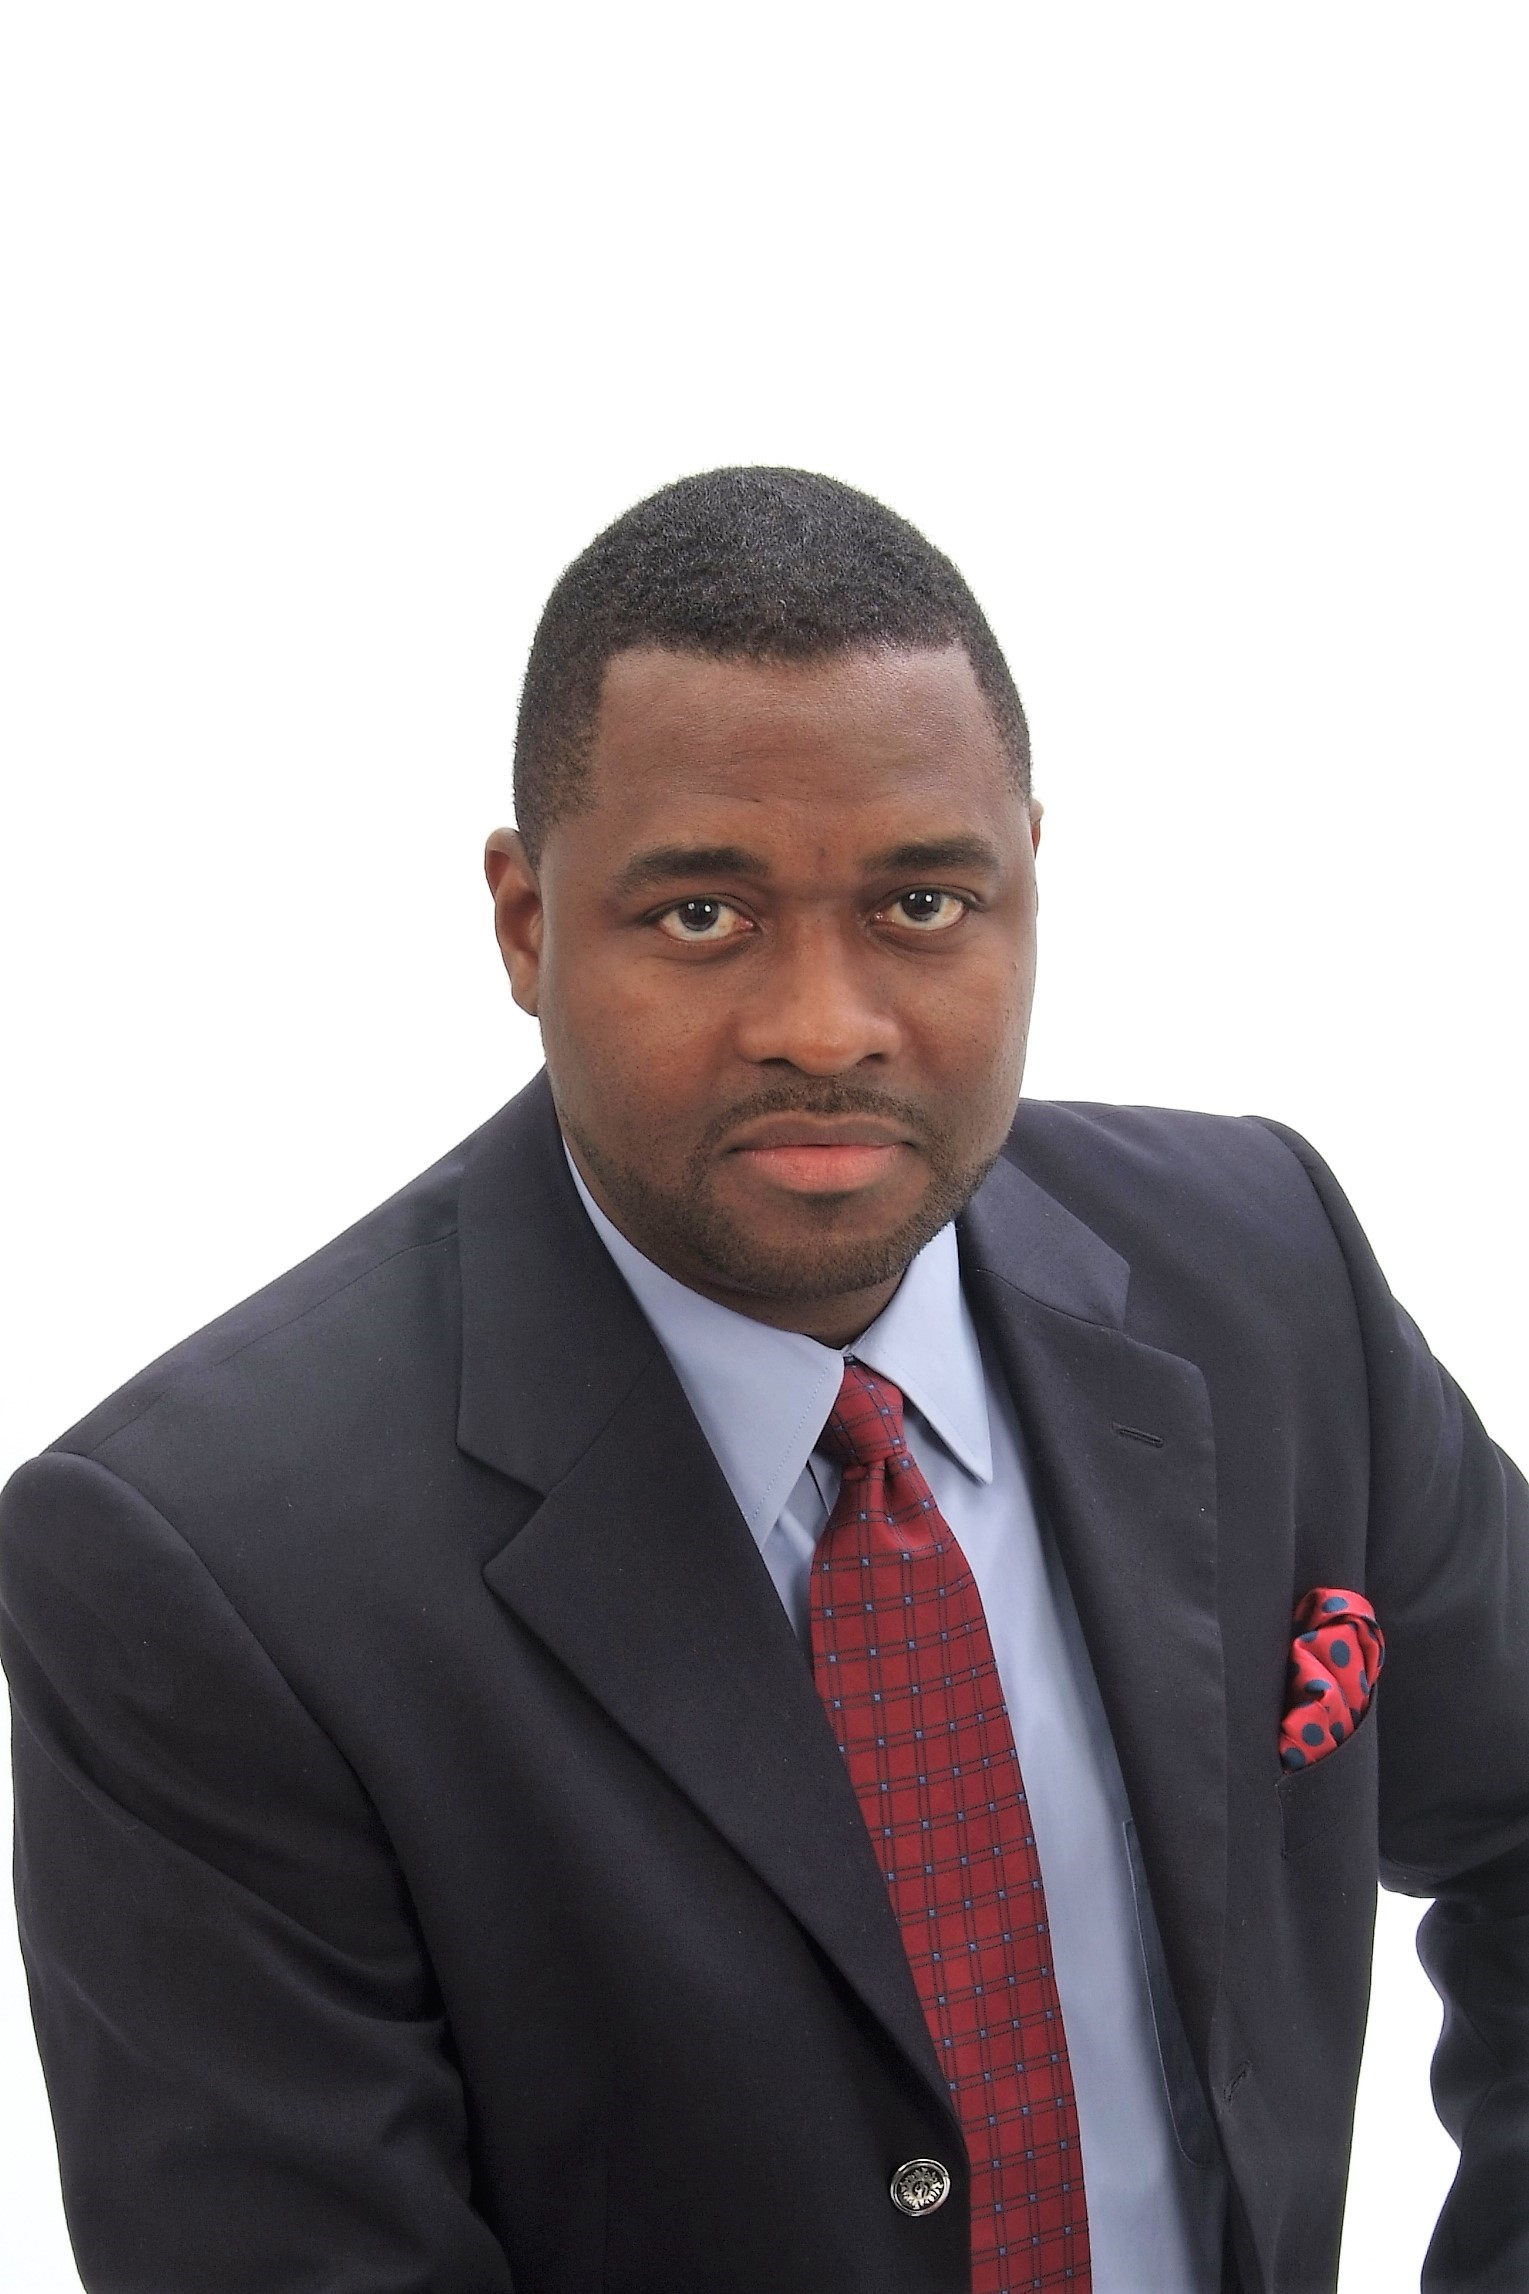 Oliver M. Falloon-Reid, MBA